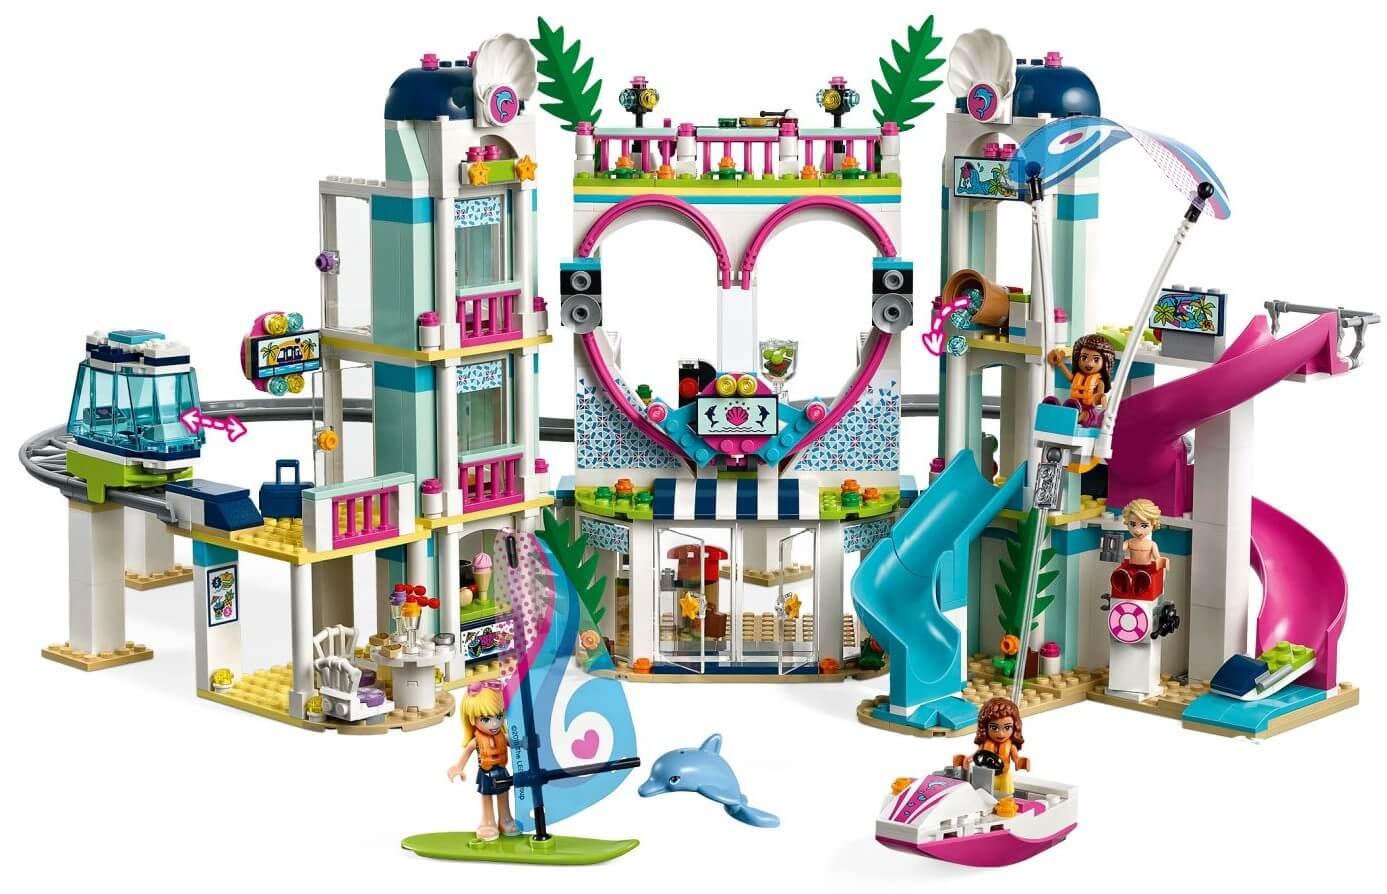 Mua đồ chơi LEGO 41347 - LEGO Friends 41347 - Khu Du Lịch Heartlake (LEGO 41347 Heartlake City Resort)